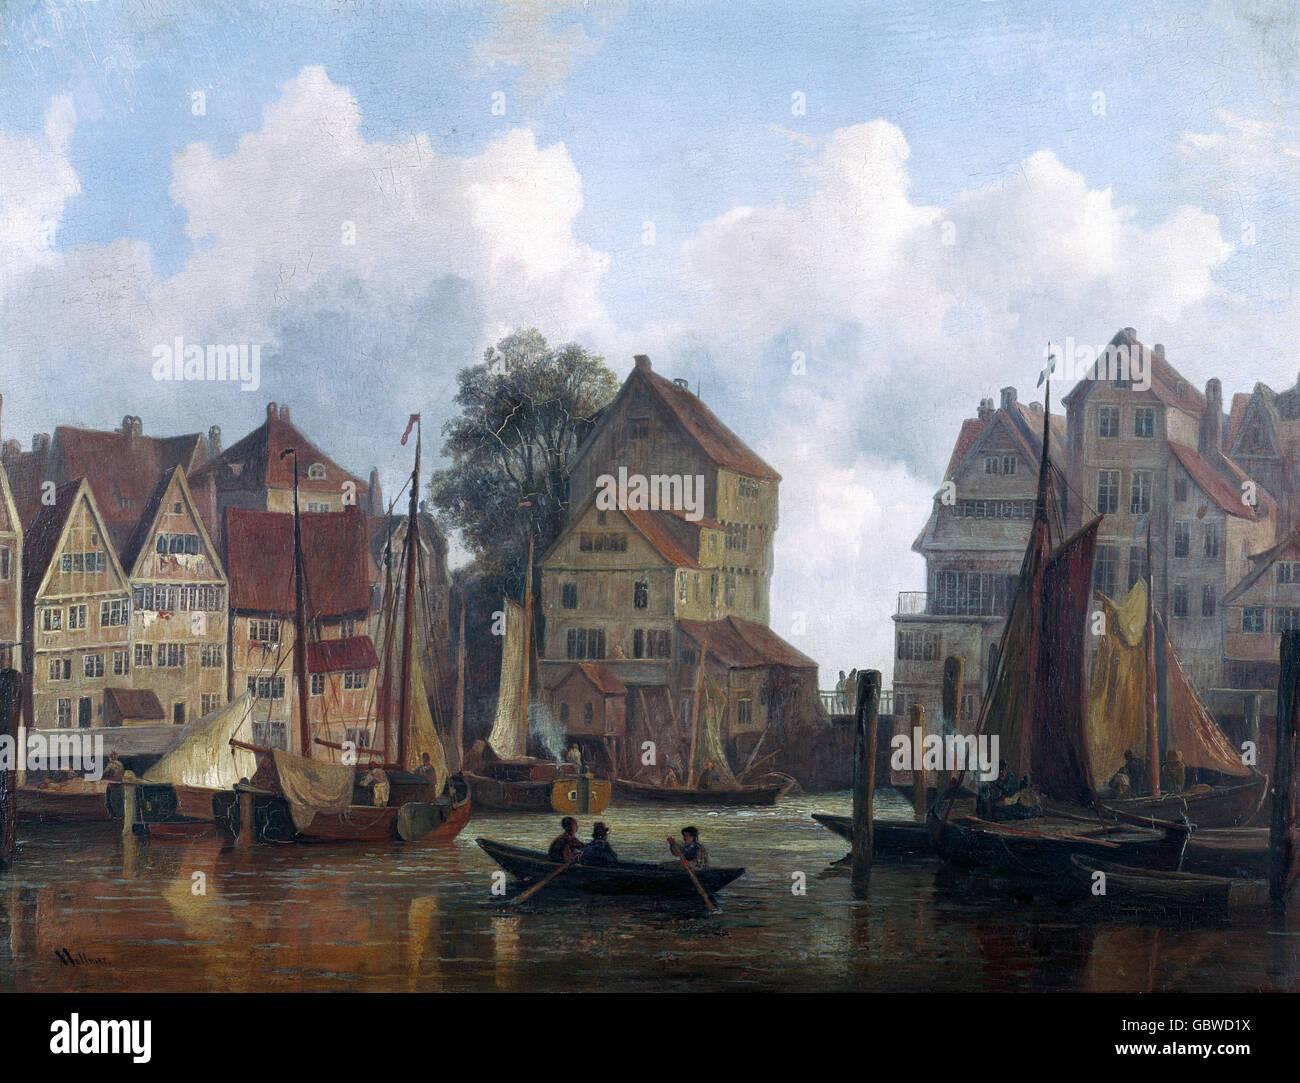 Beaux-arts, Vollmer, Adolph Friedrich (1806 - 1875), peinture, 'Die kleine Alster' (Le Petit Lac Alster), Photo Stock